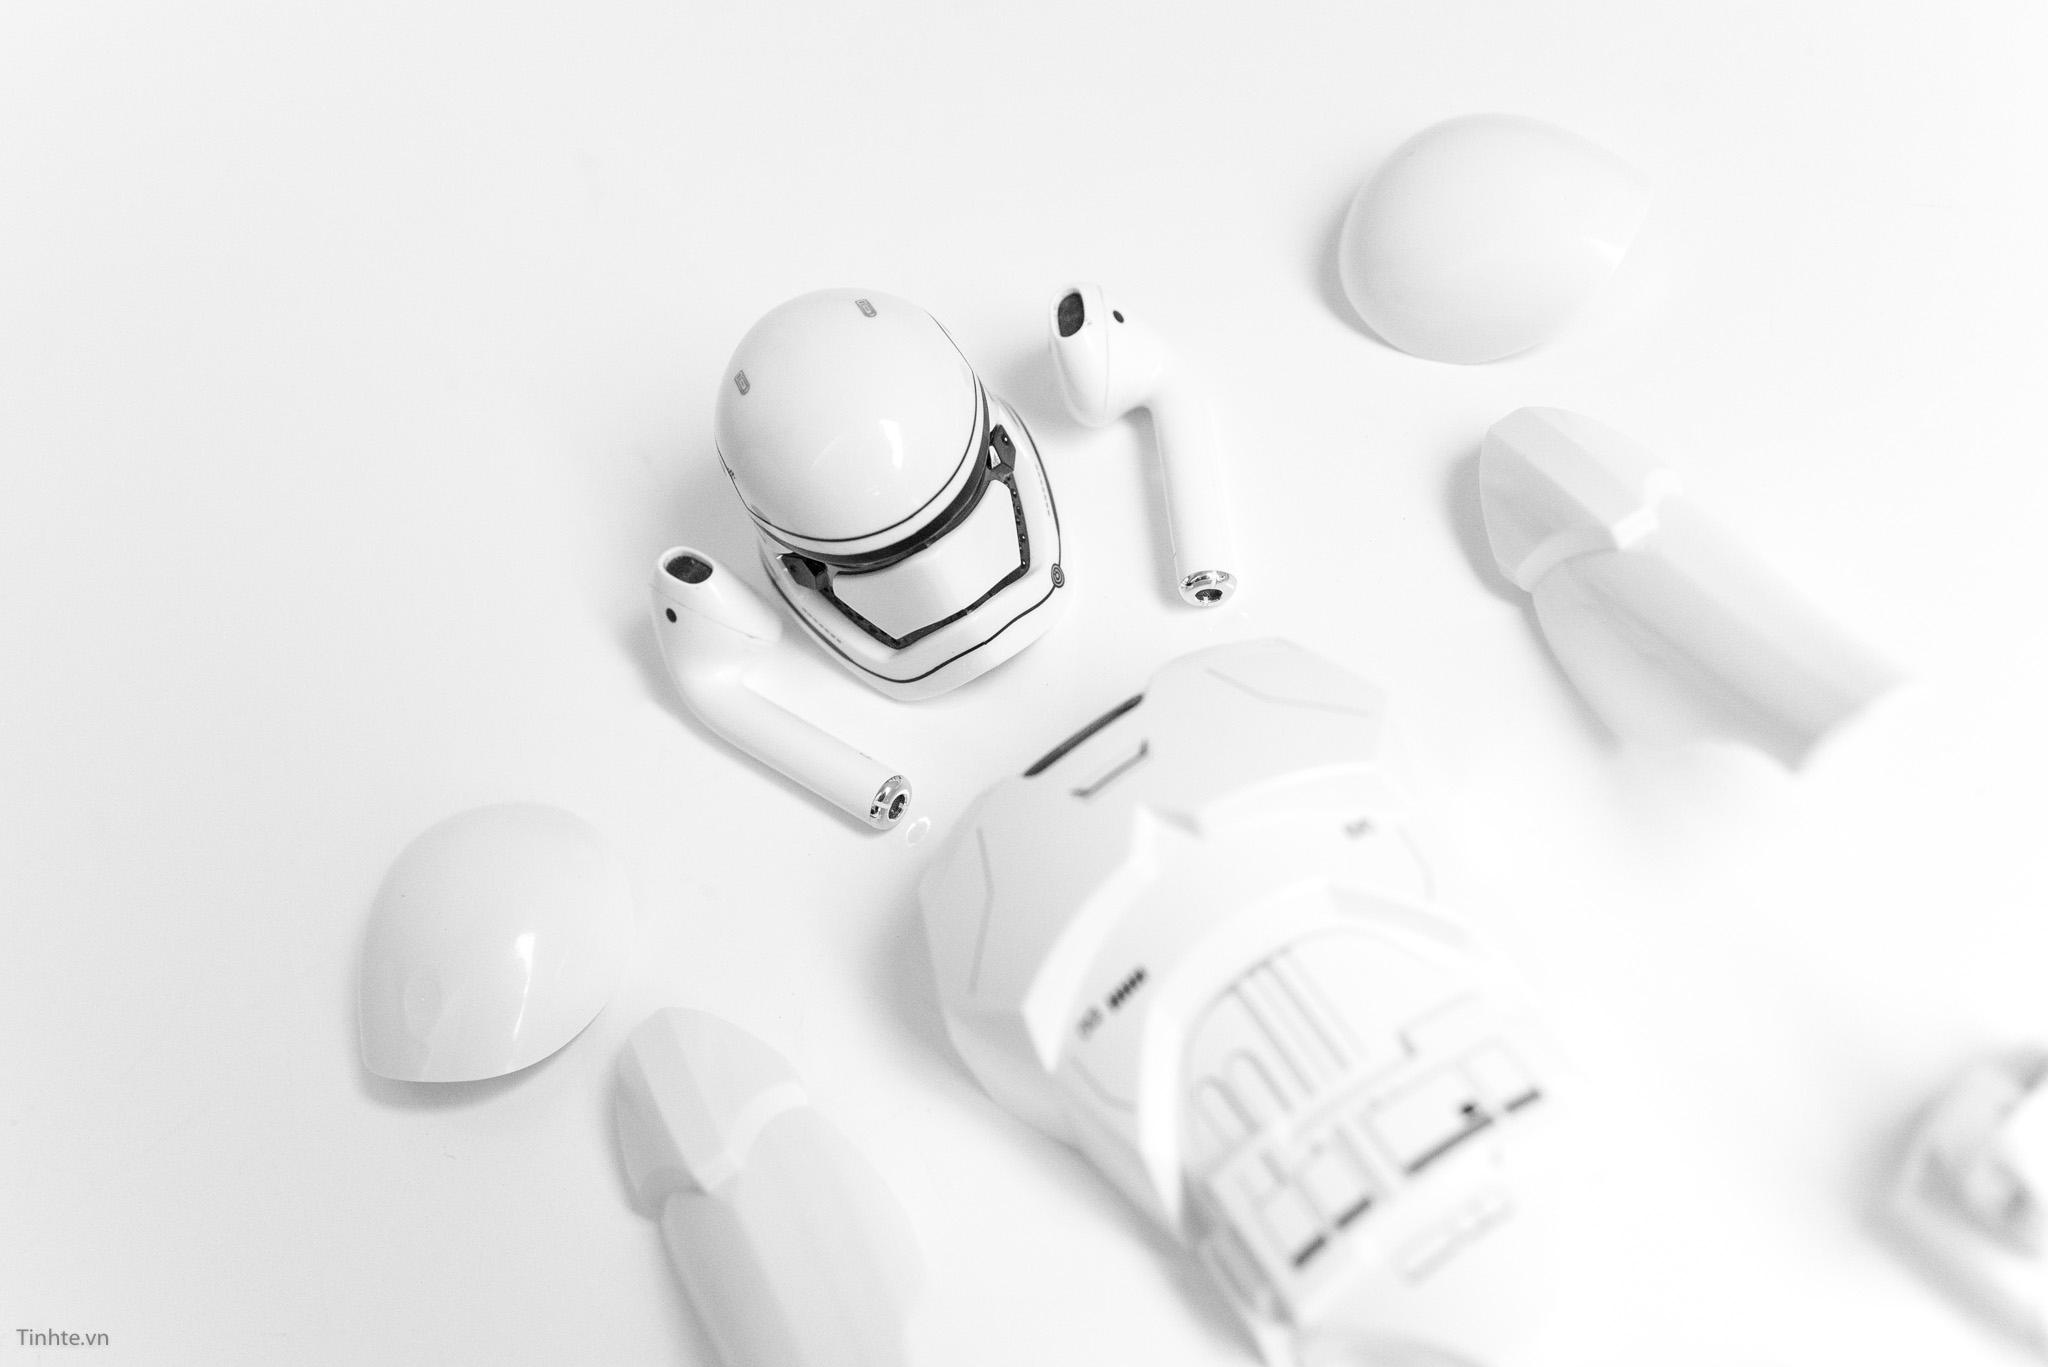 airpods-stormtrooper-tinhte-11.jpg